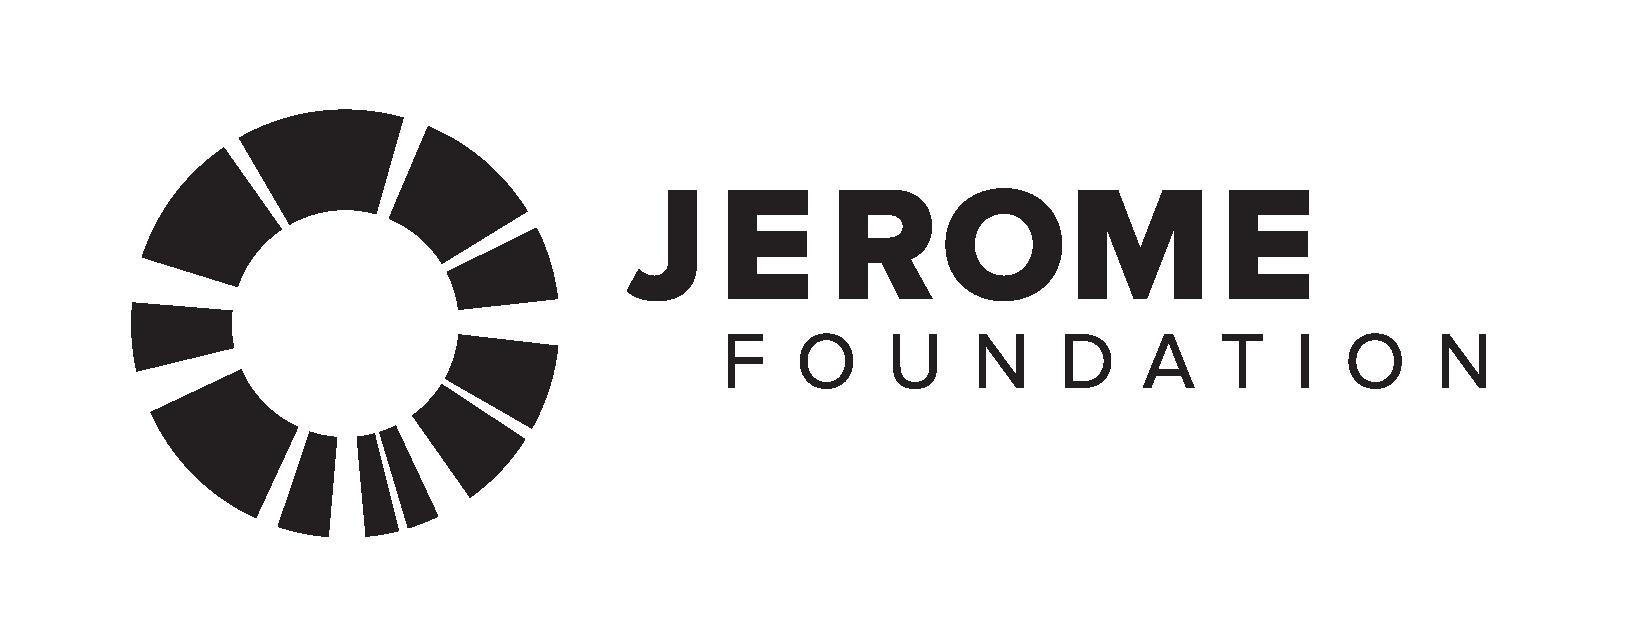 Jerome Foundation Logo